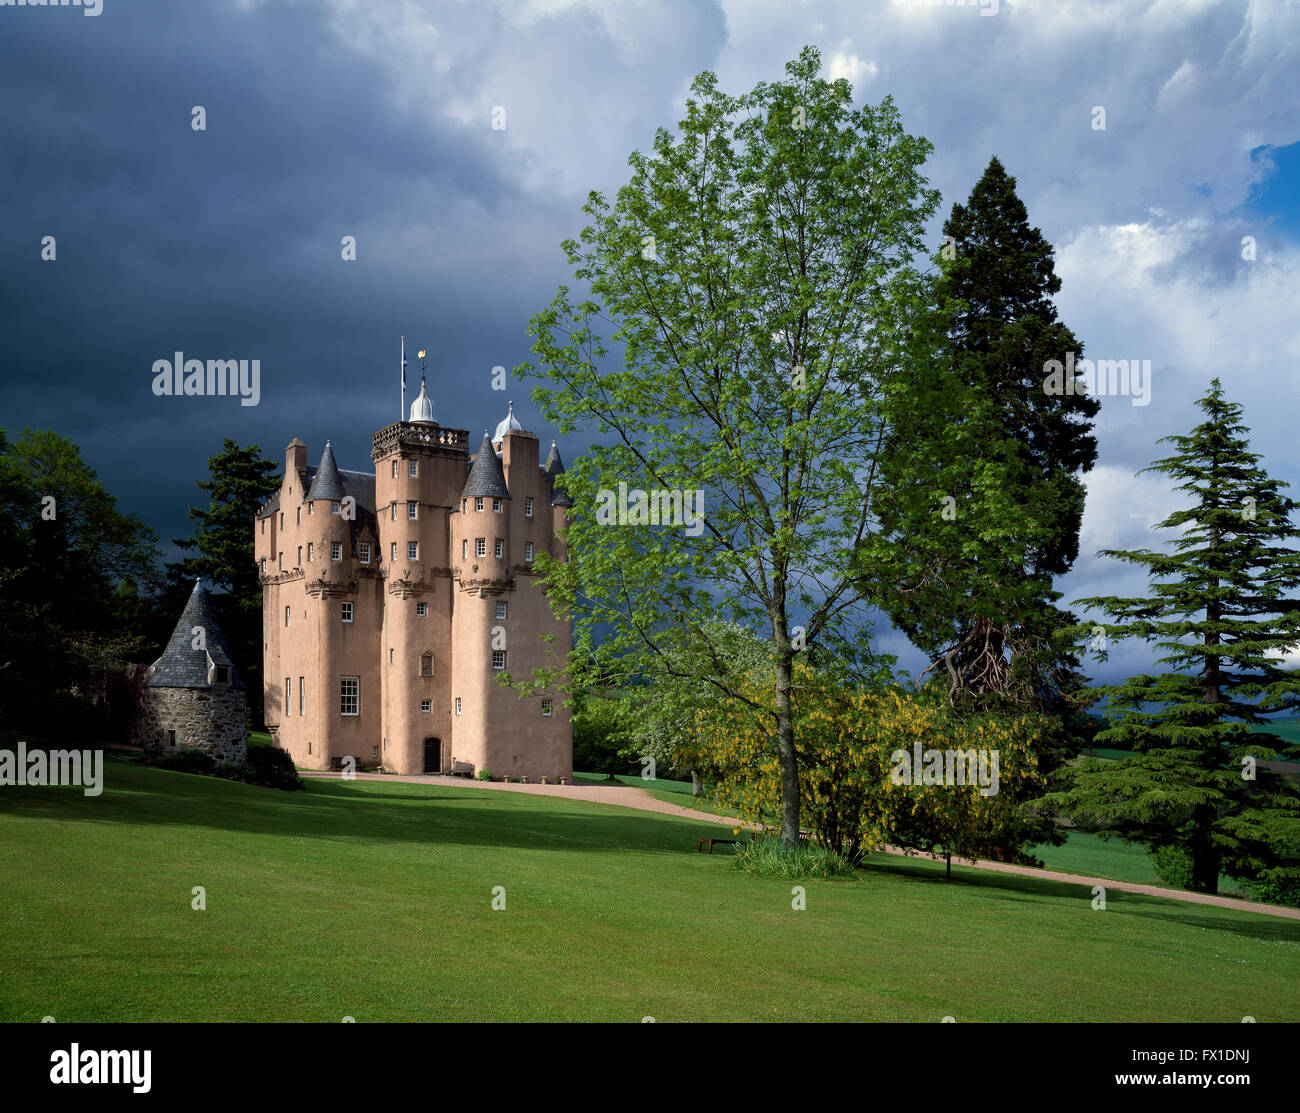 Craigievar Castle, Grampian Region, Scotland, United Kingdom - Stock Image